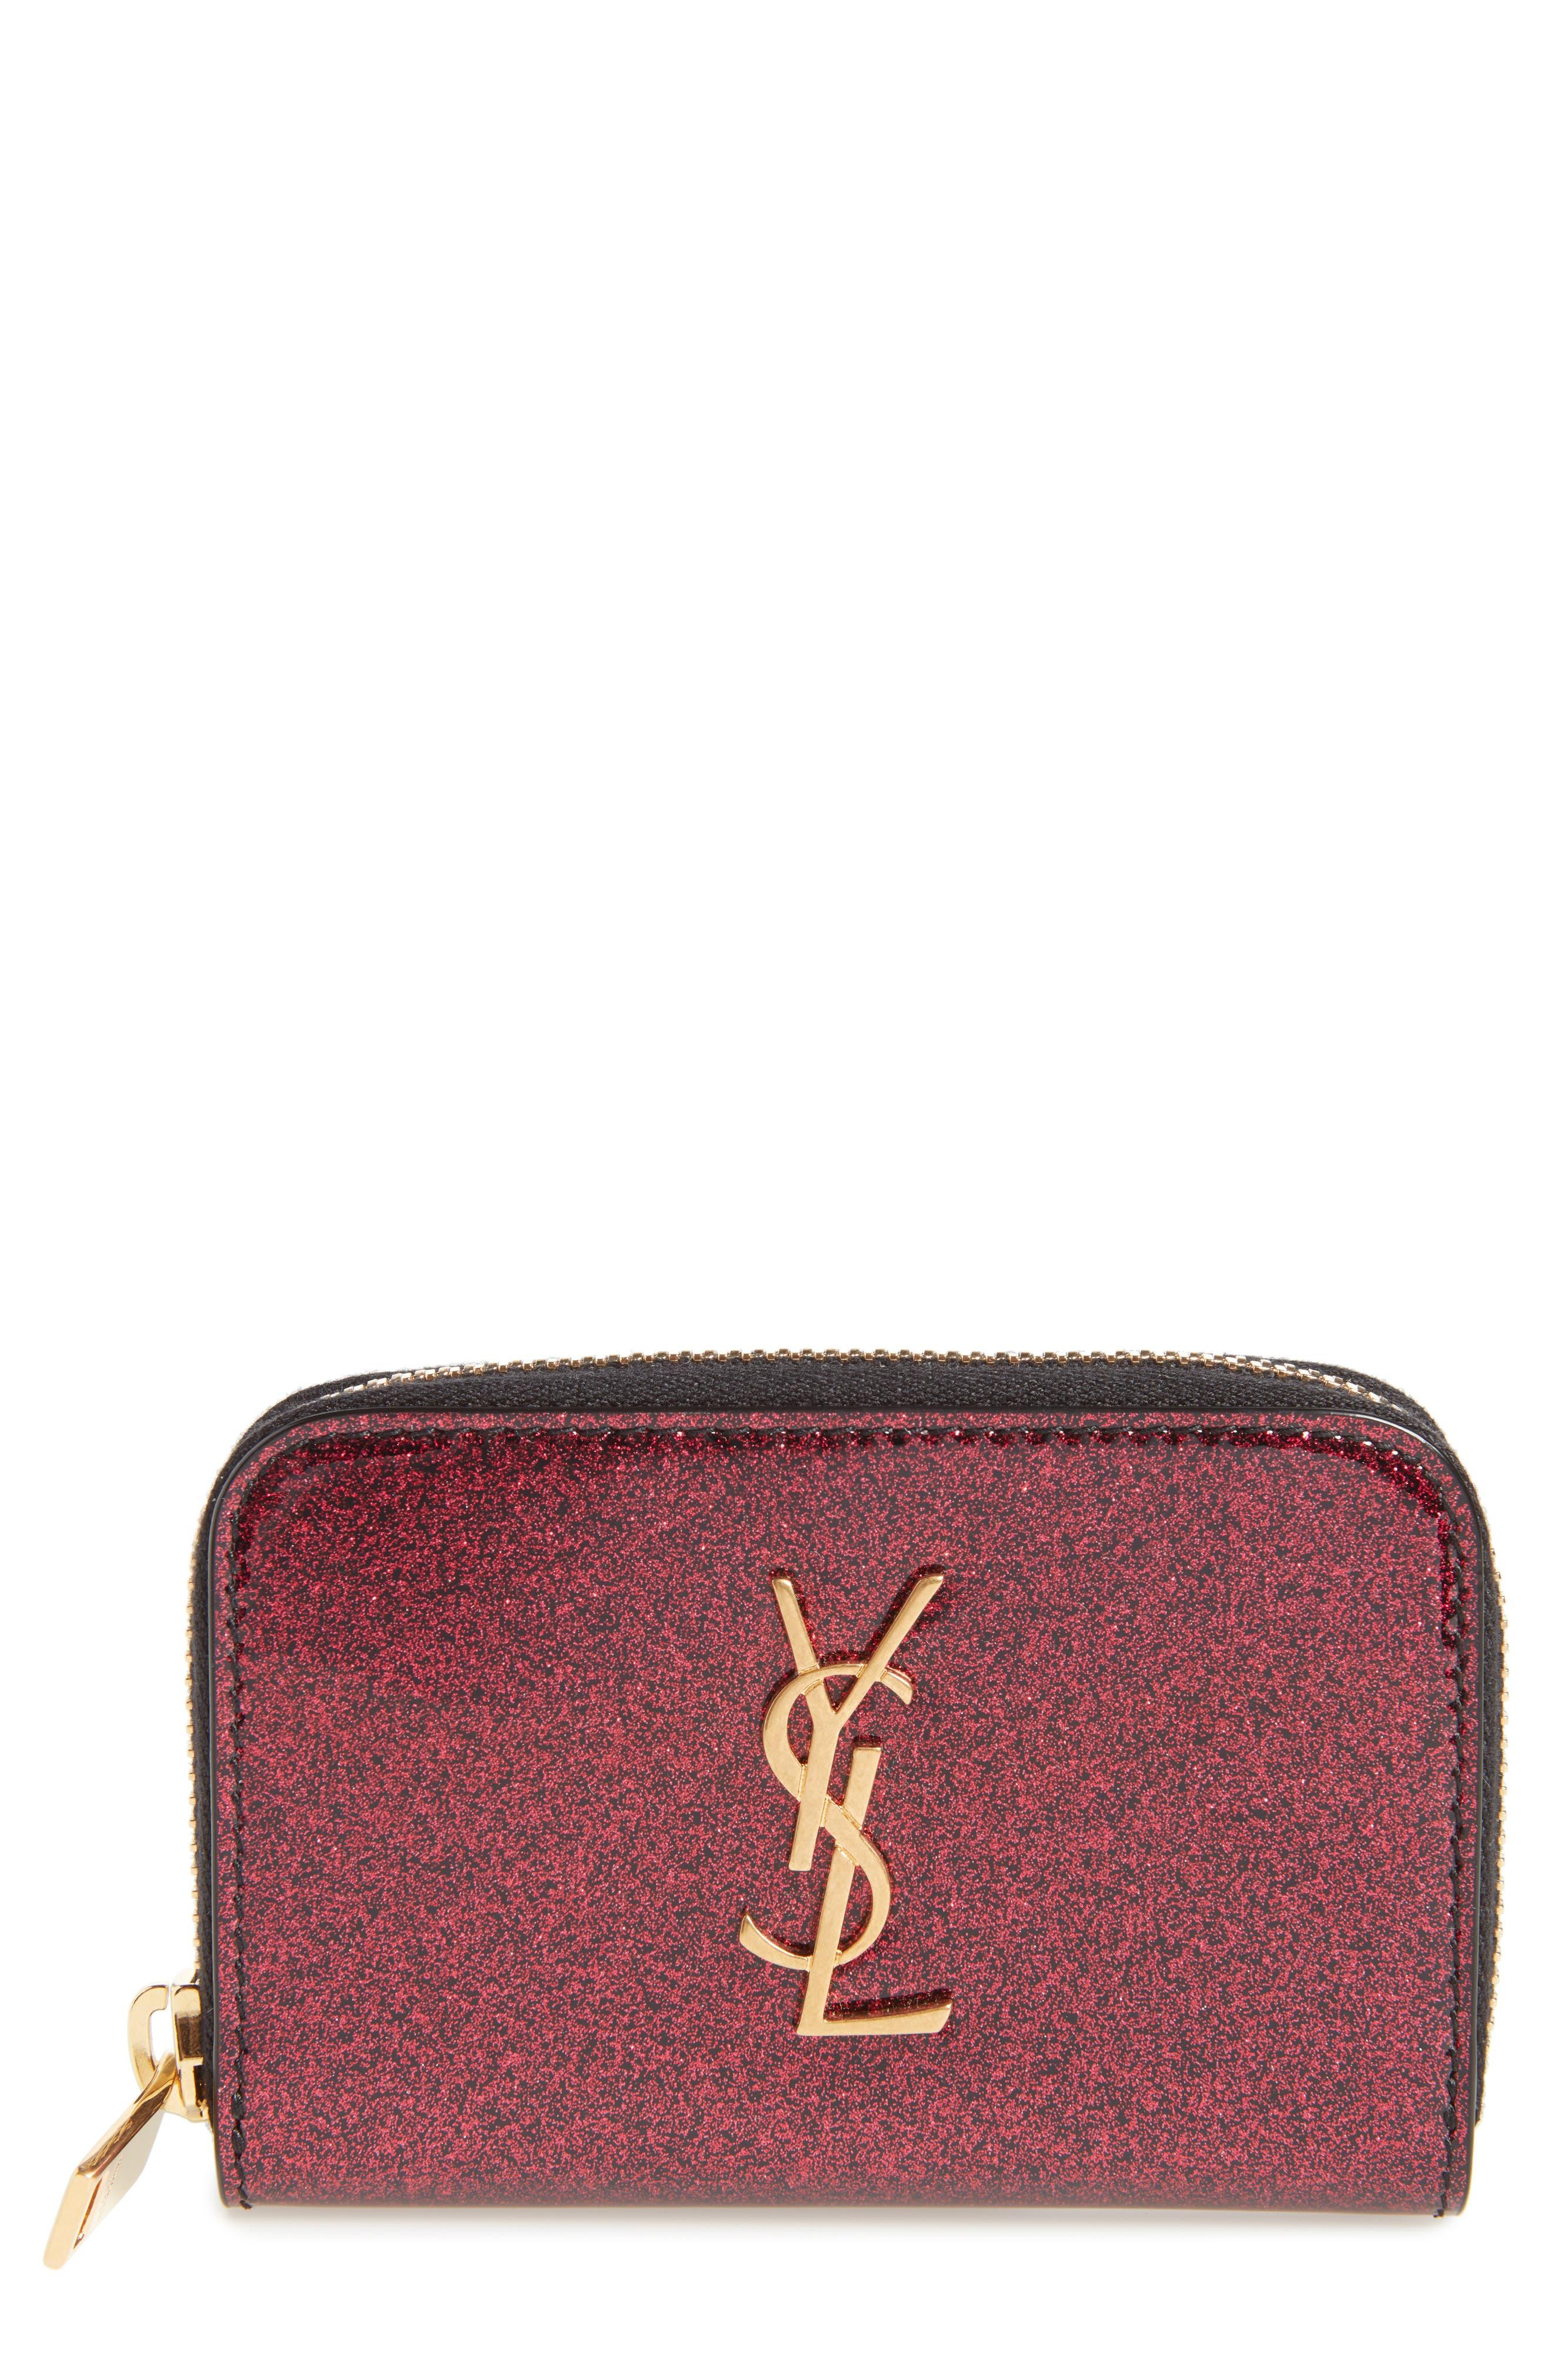 Glitter Calfskin Leather Wallet,                             Main thumbnail 1, color,                             SHOCKING PINK/ NOIR